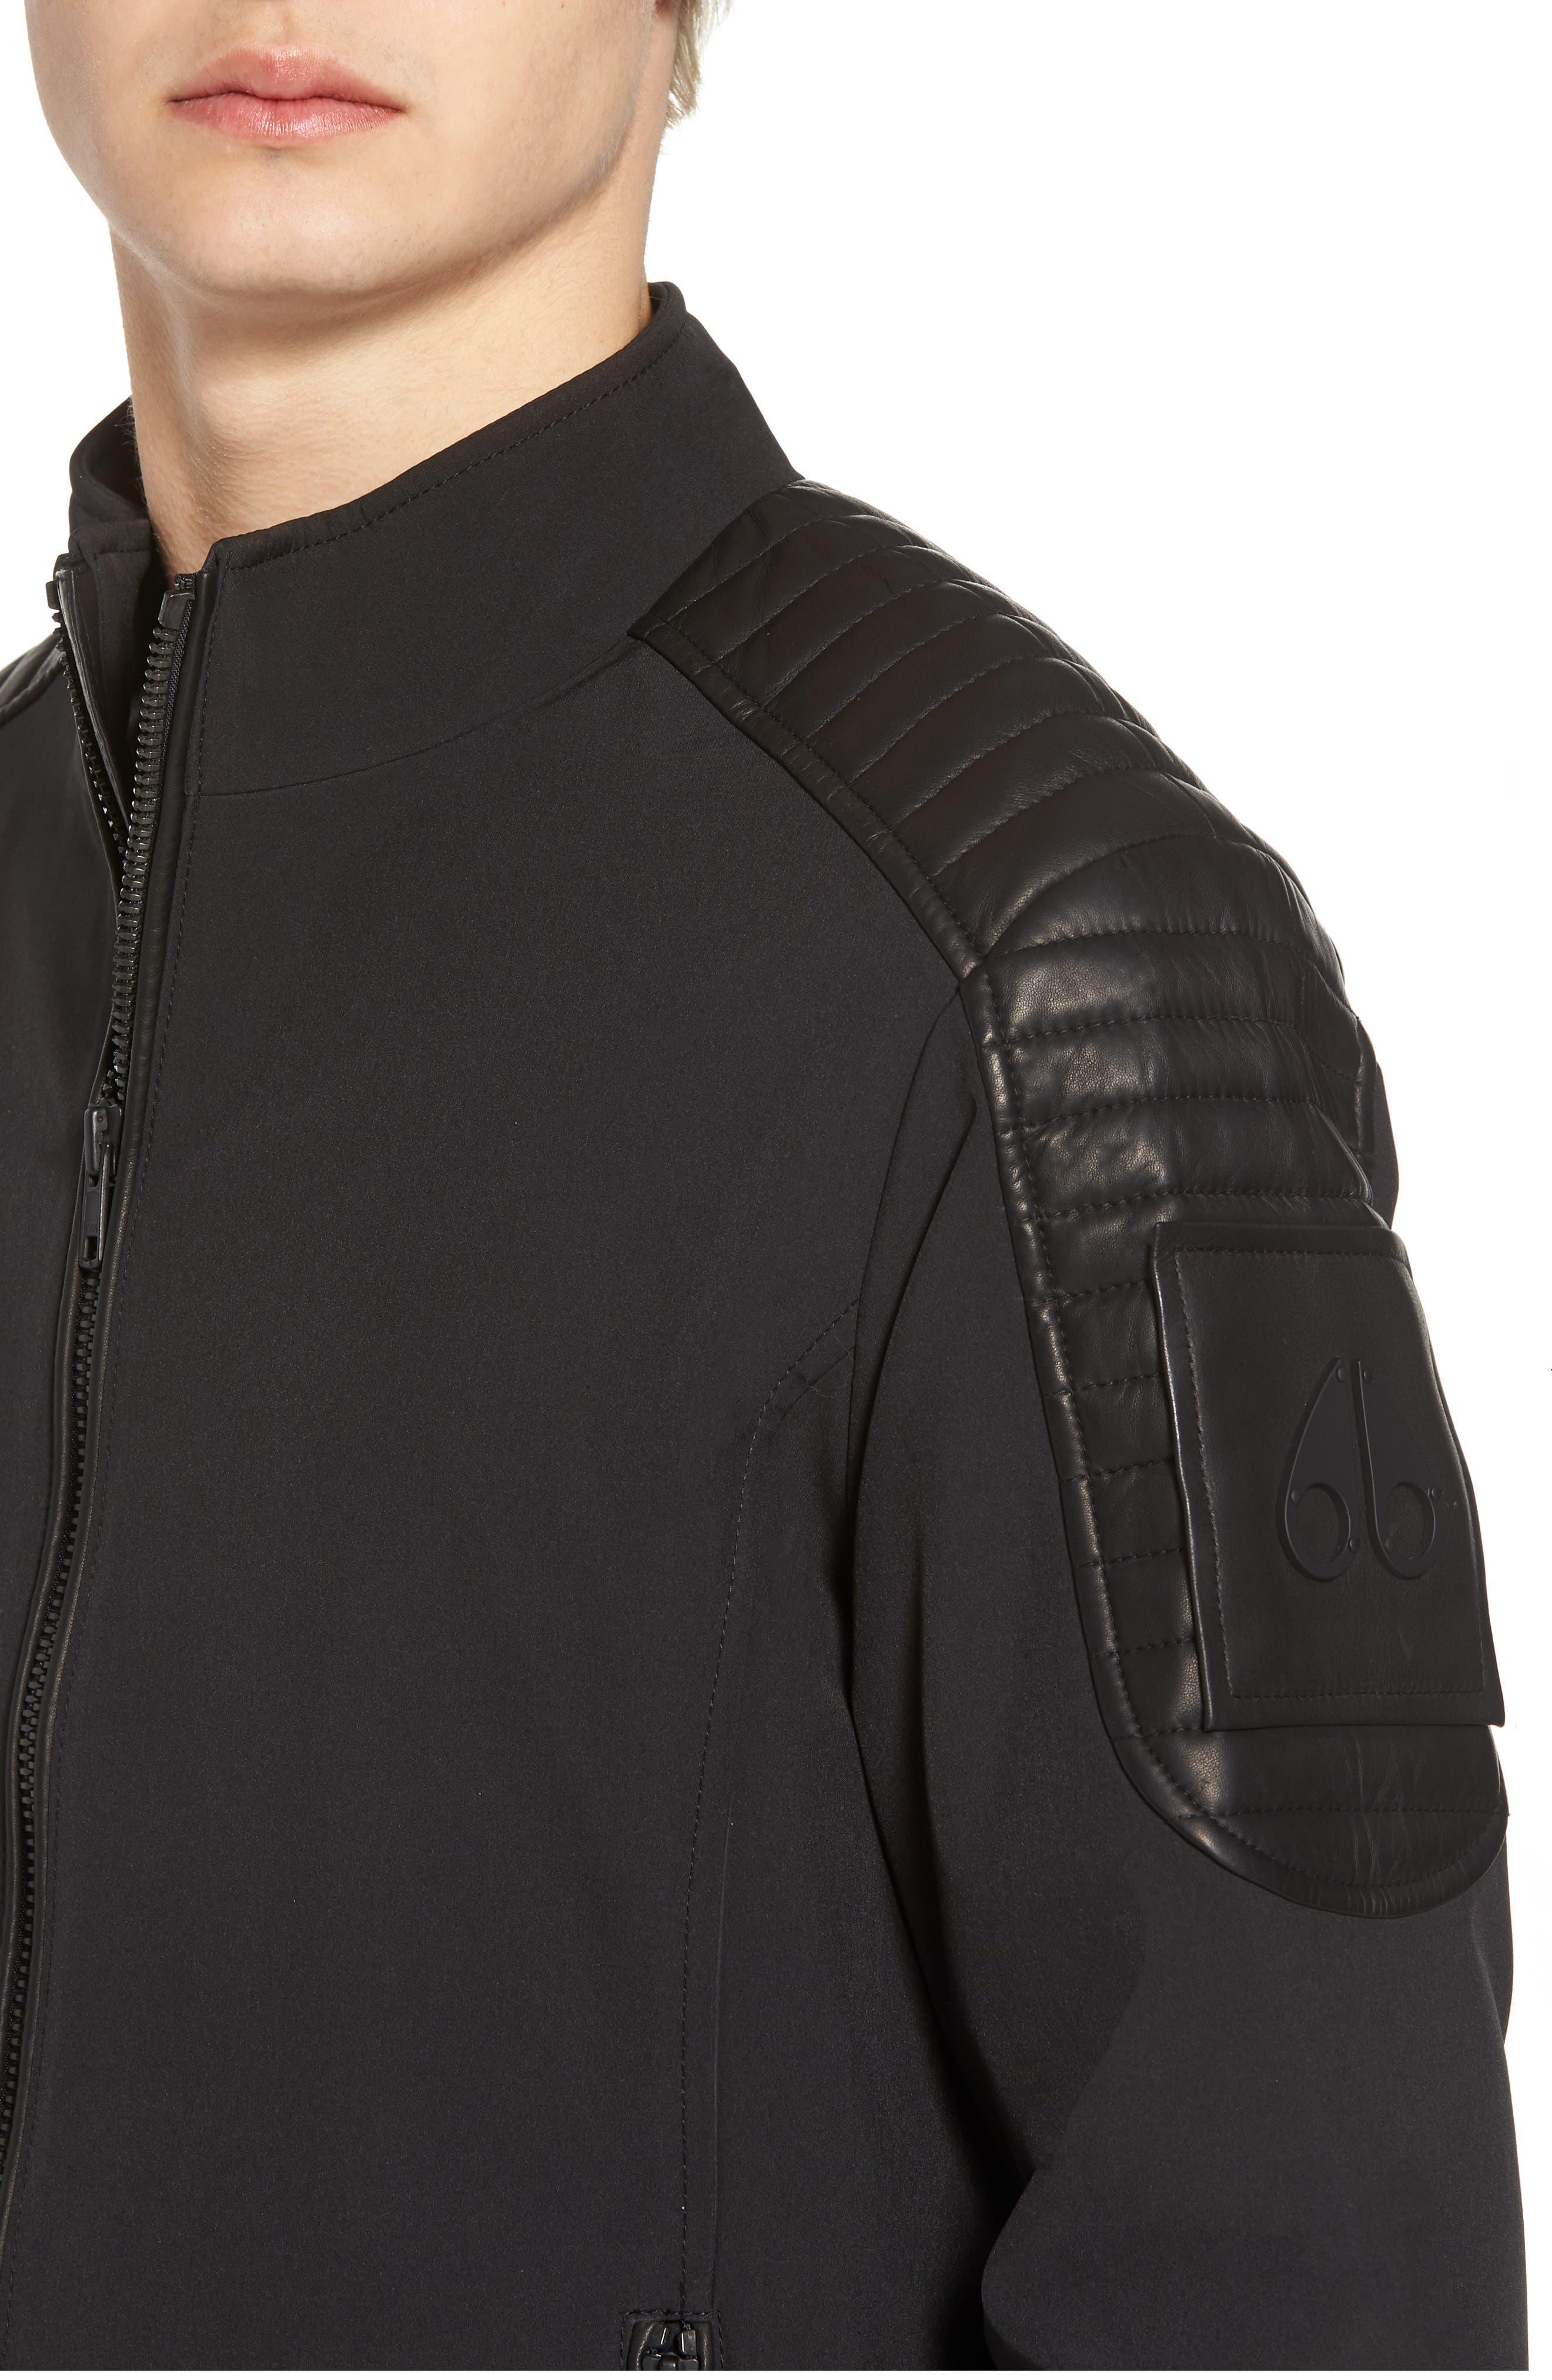 Grindstone Water Repellent Jacket,                             Alternate thumbnail 4, color,                             Black